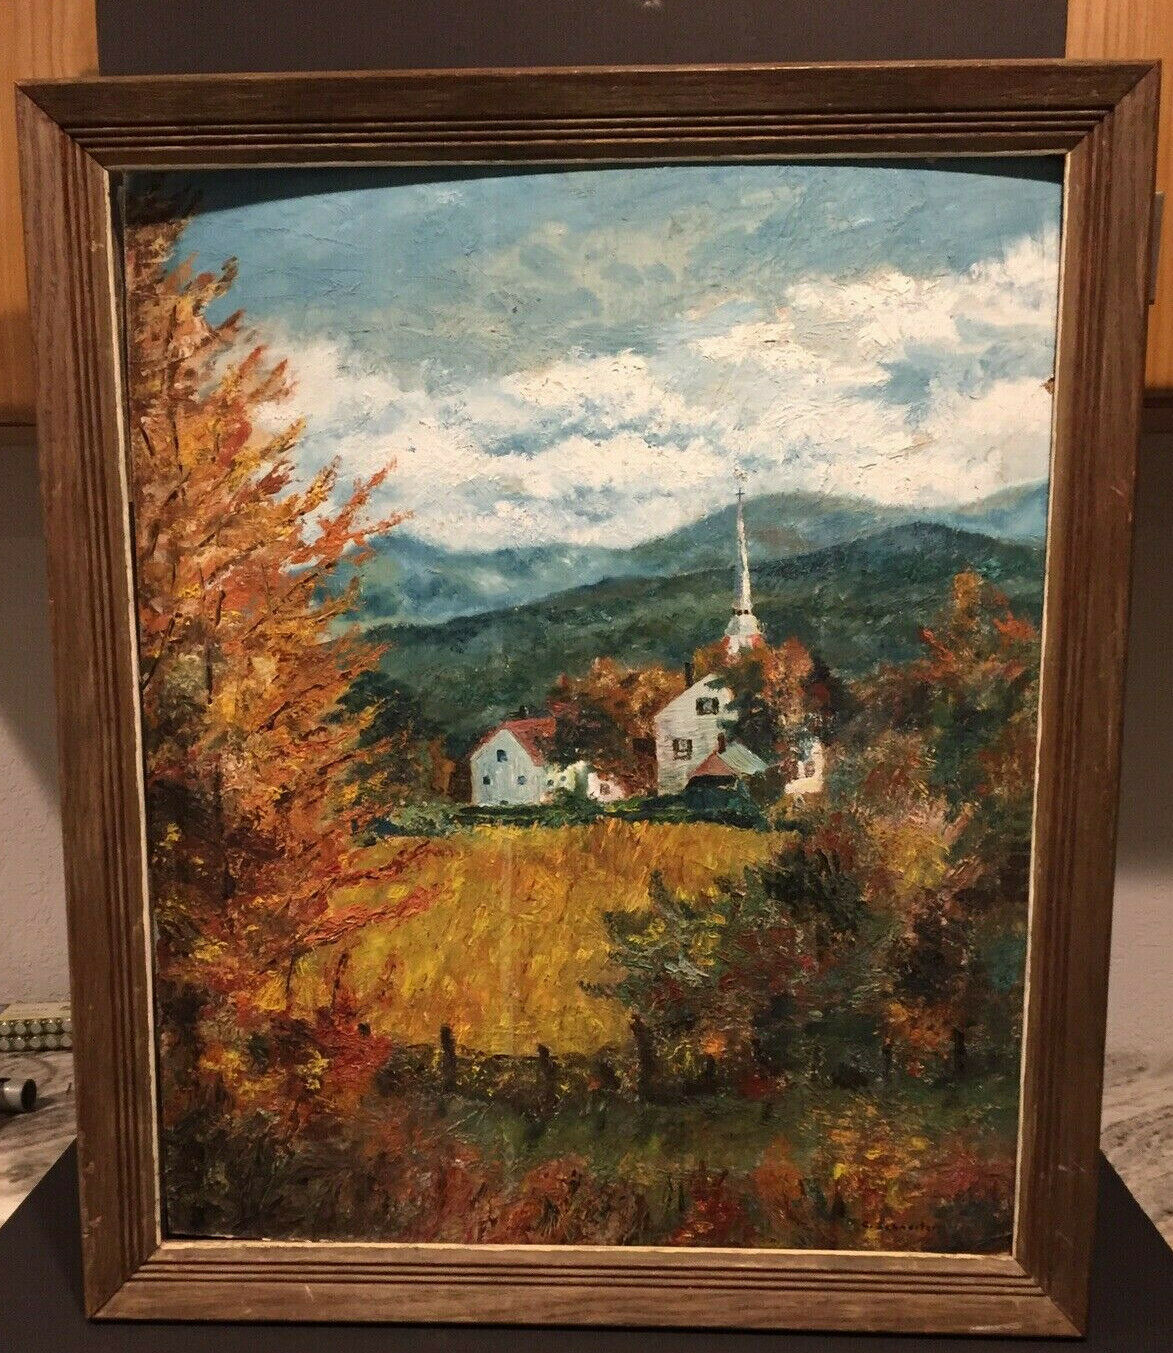 Vintage Original Painting On Canvas Landscape Art Signed By Artist C. Schneiter 6